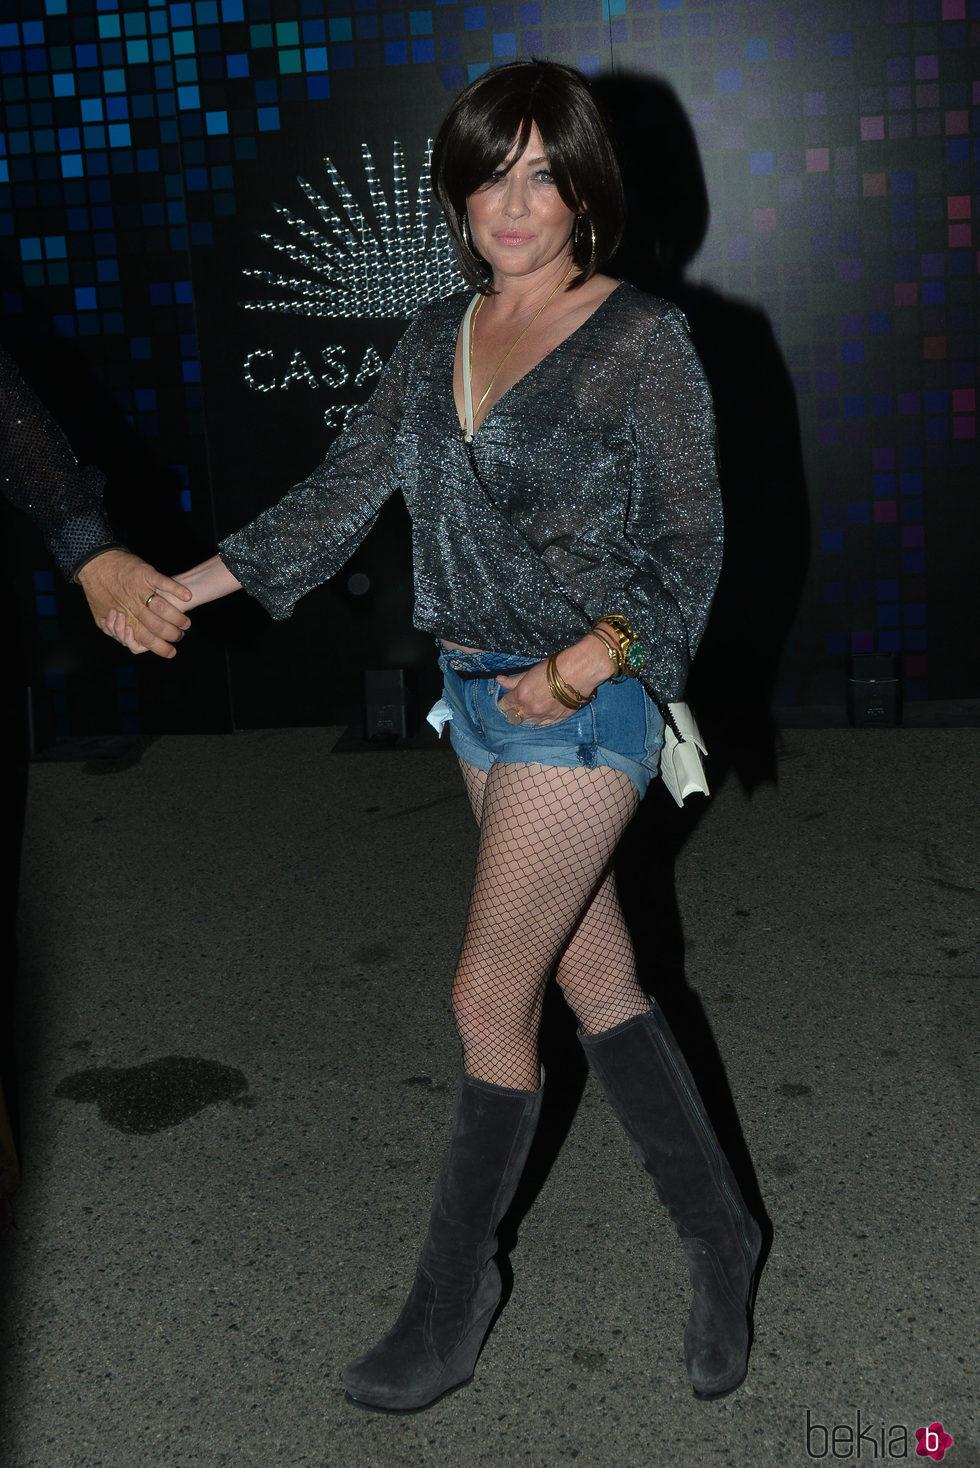 Shannen Doherty en una fiesta de Halloween en Hollywood